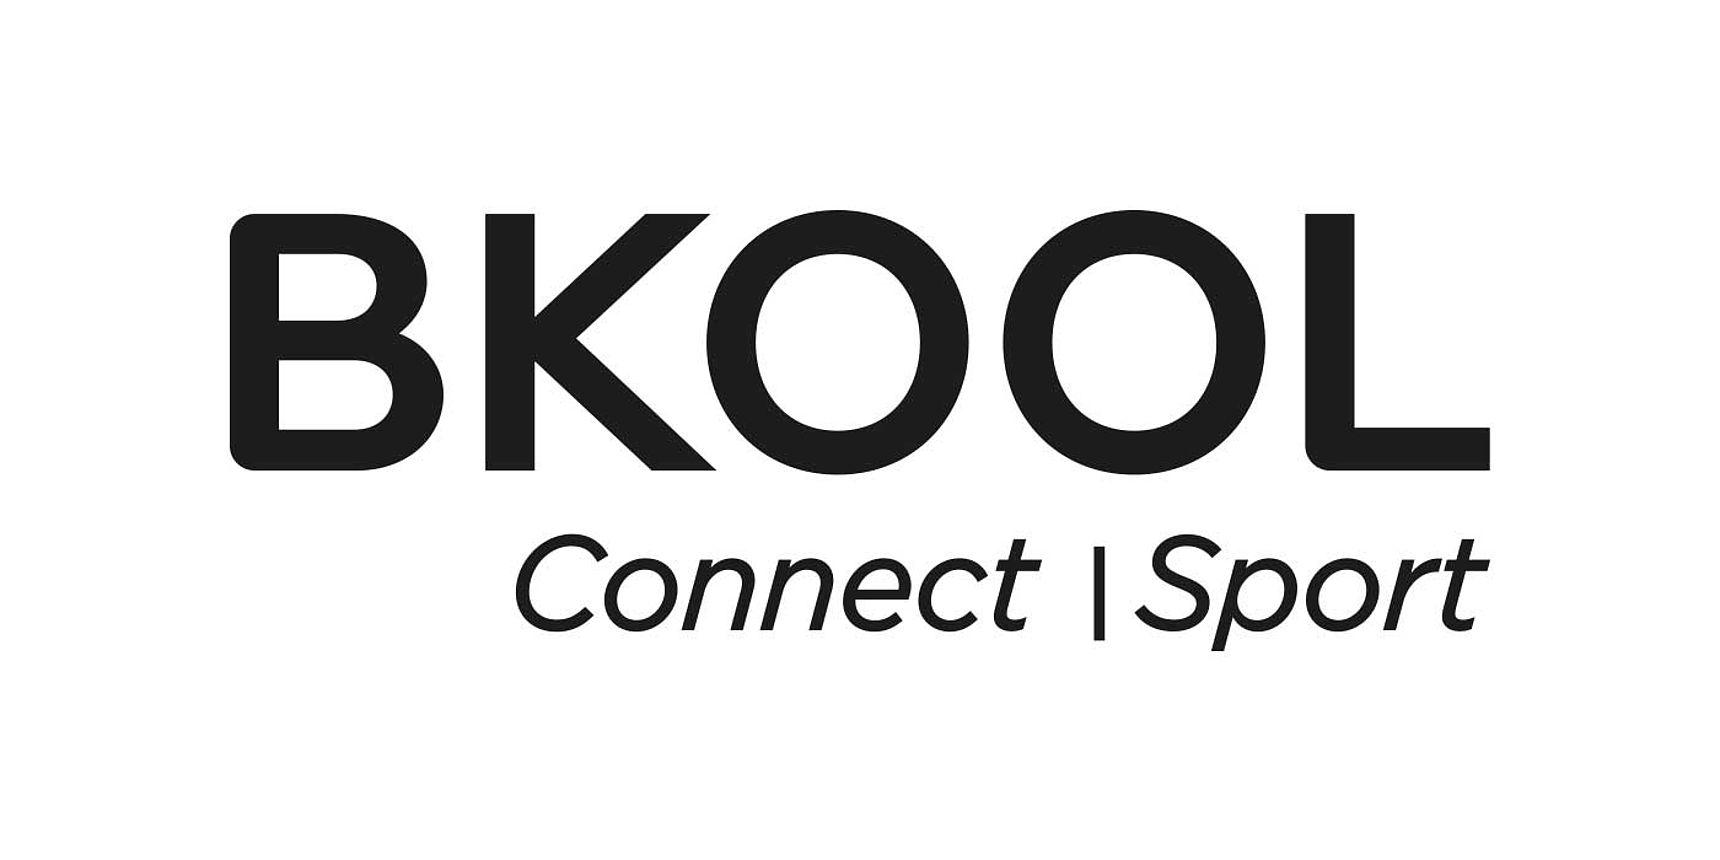 [Translate to English:] BKOOL Logo